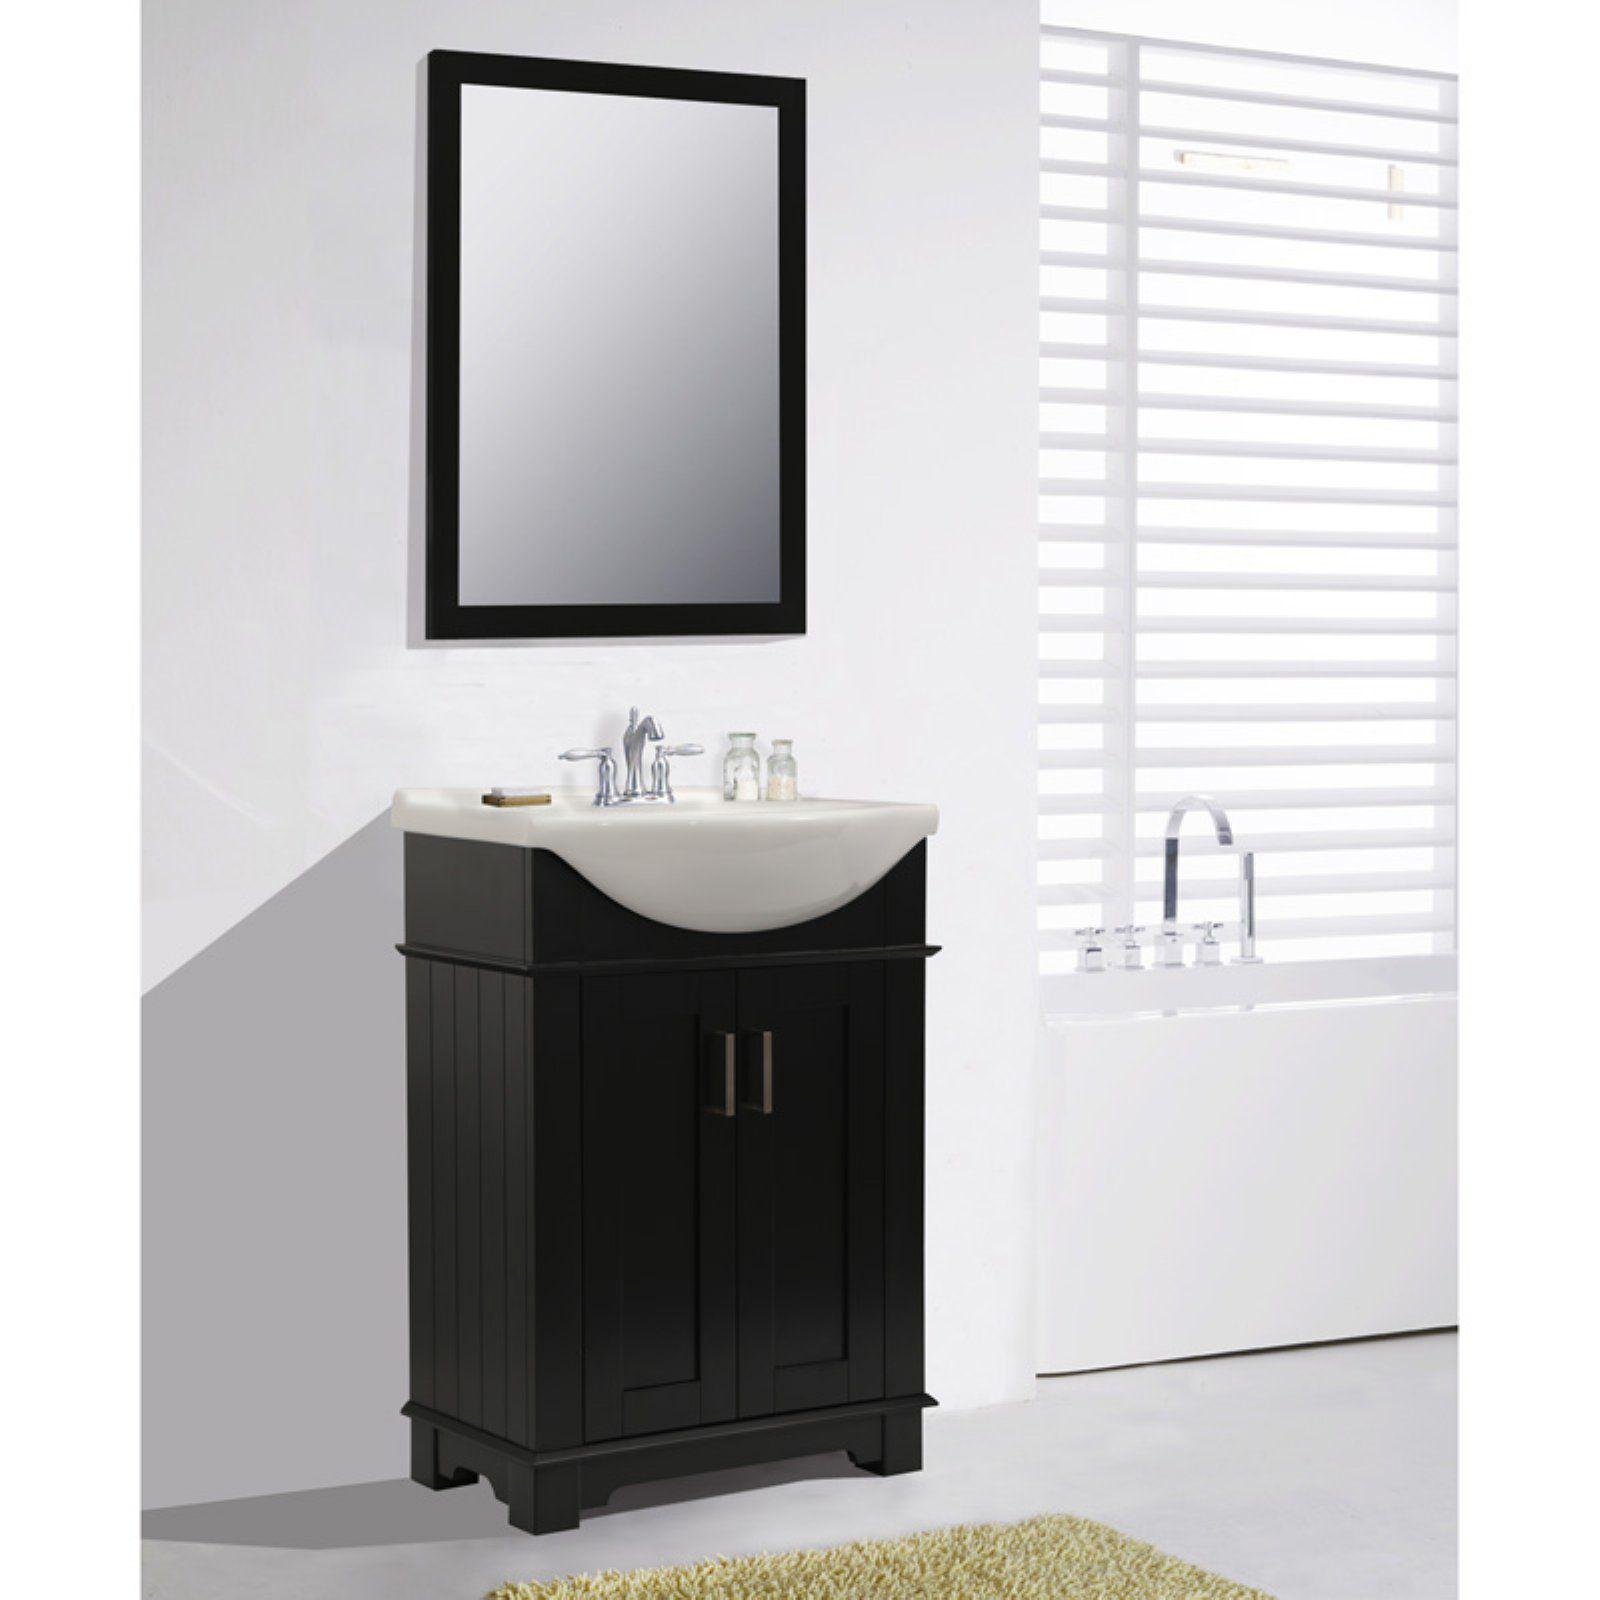 Legion Furniture WLF6042 24 in. Single Bathroom Vanity